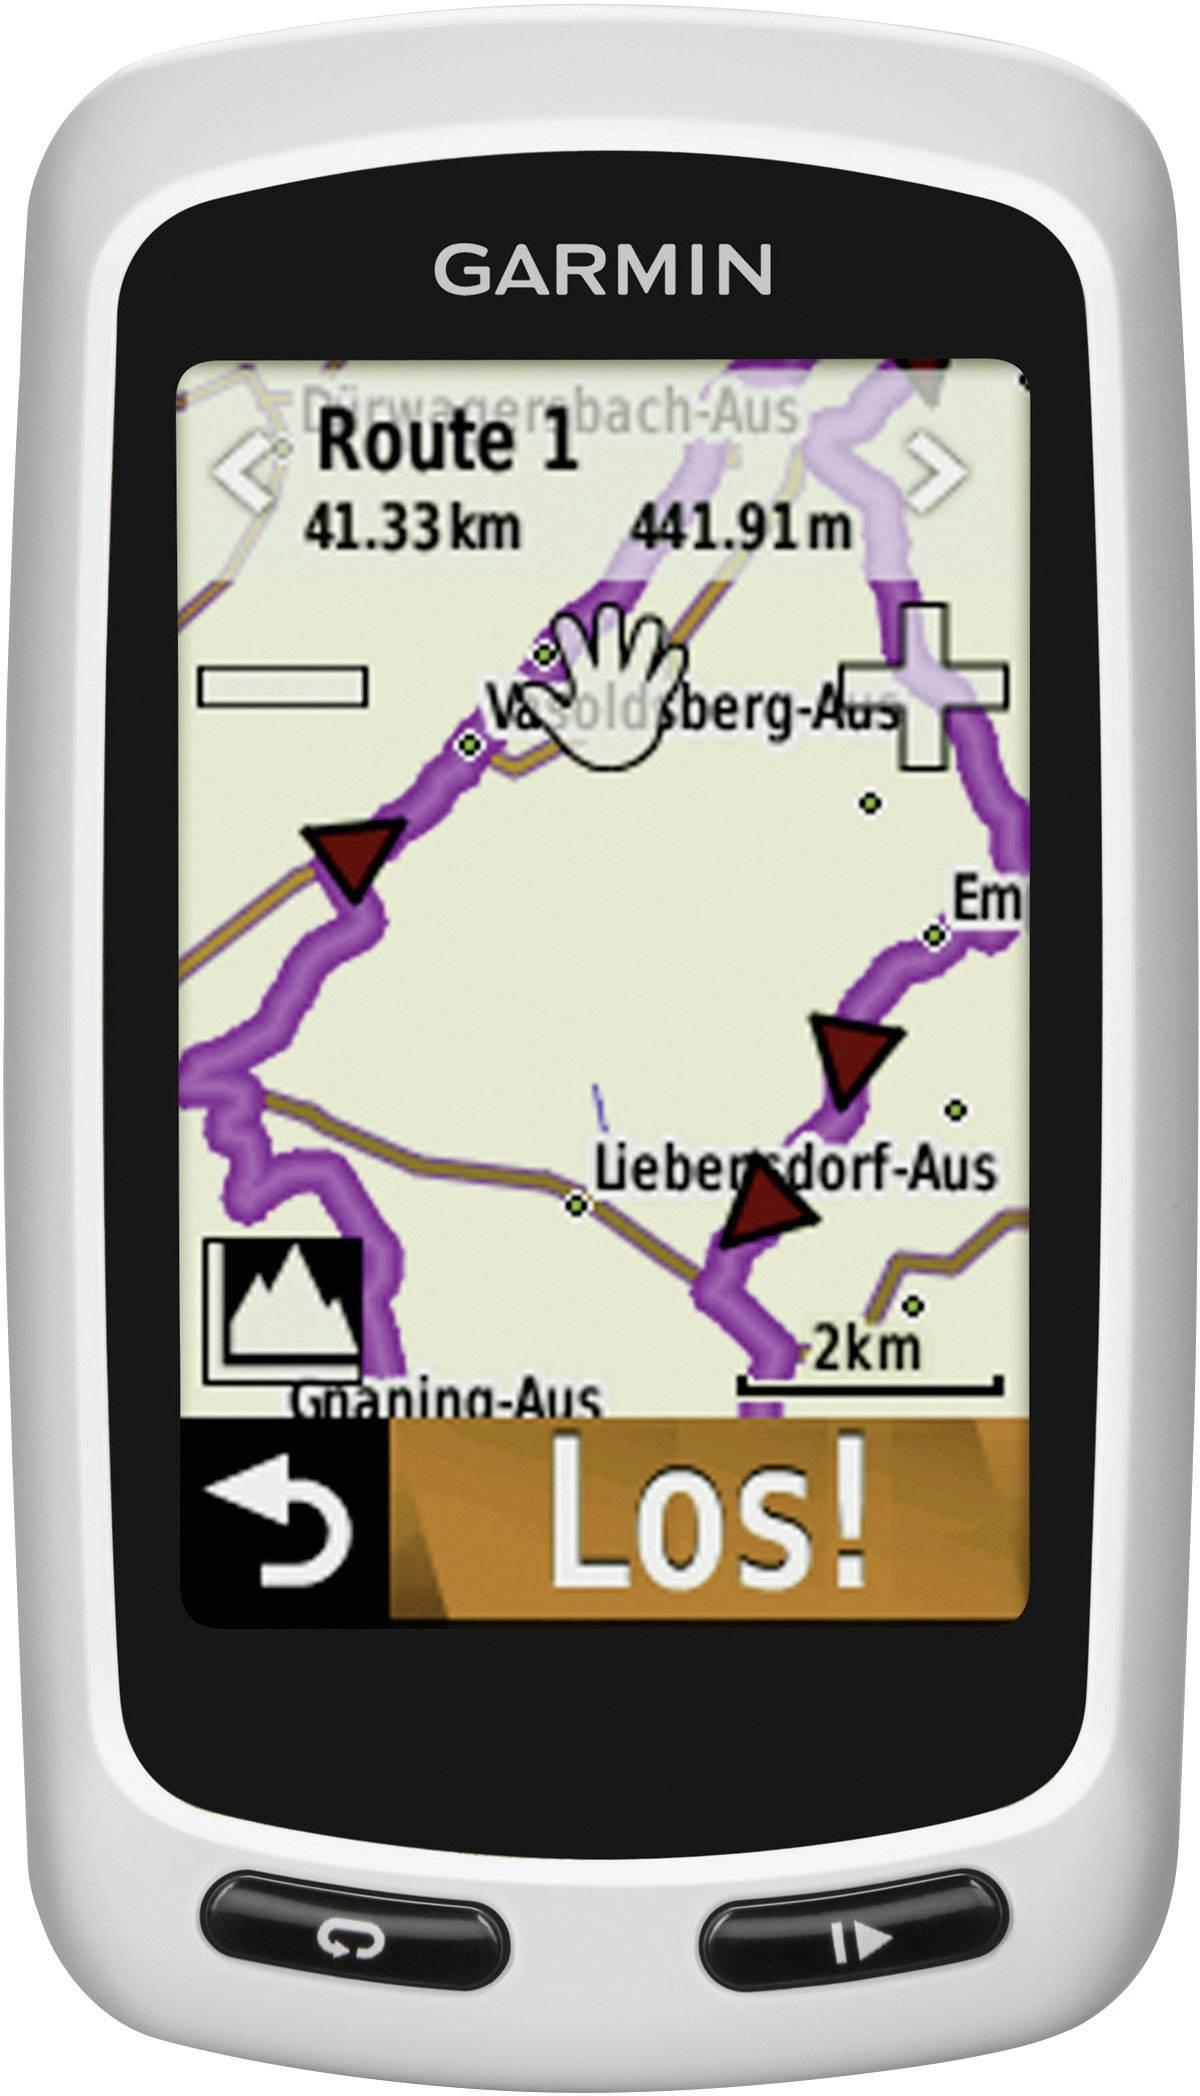 Outdoorová navigácia Garmin Edge Touring pre Európu